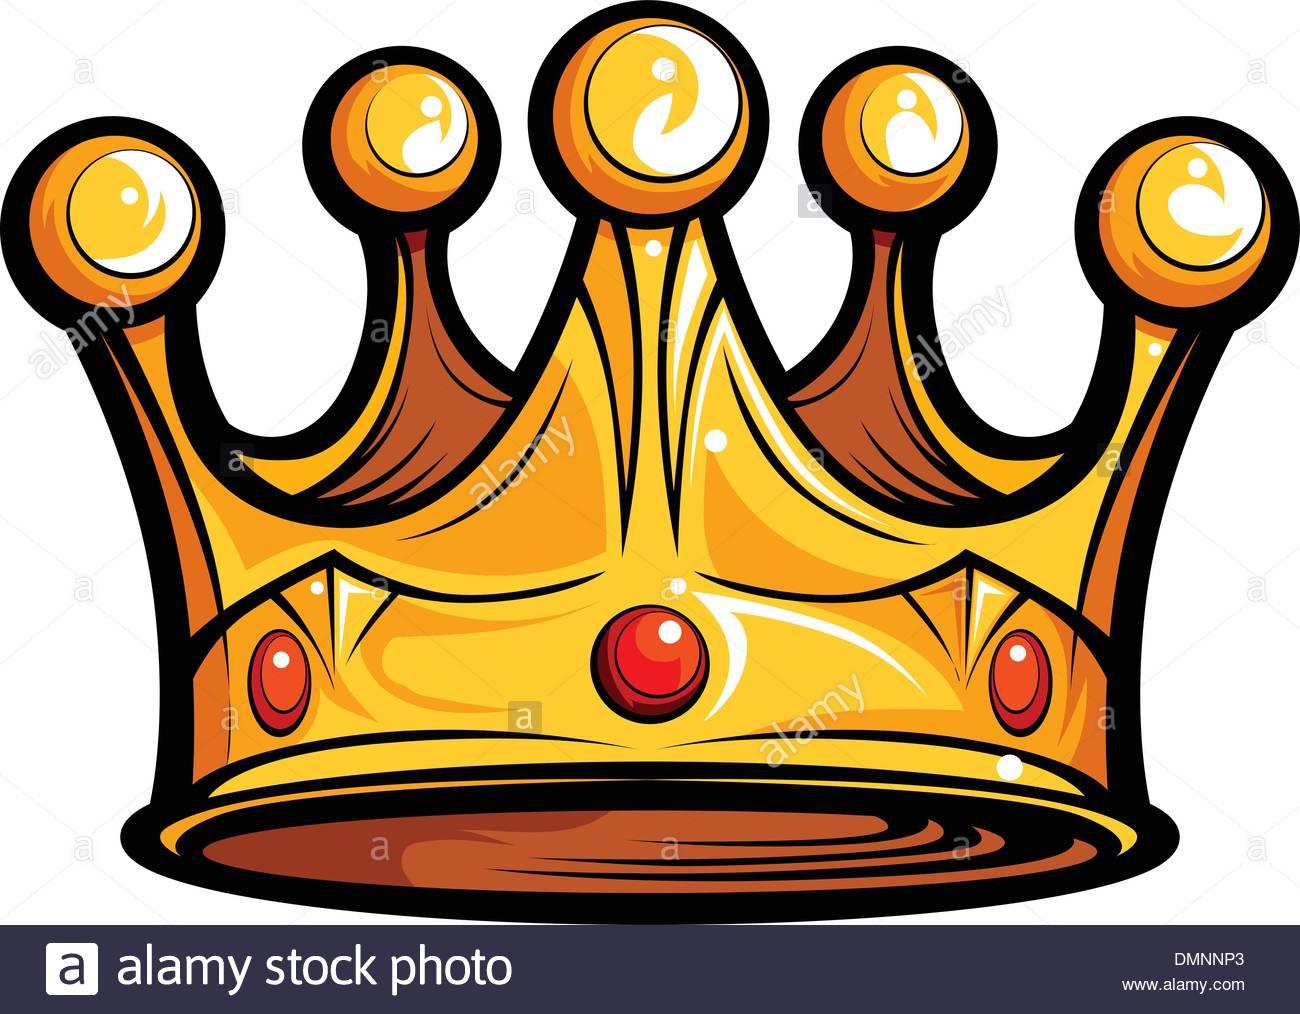 Royalty or Kings Crown Cartoon Vector Image Stock Vector Art.